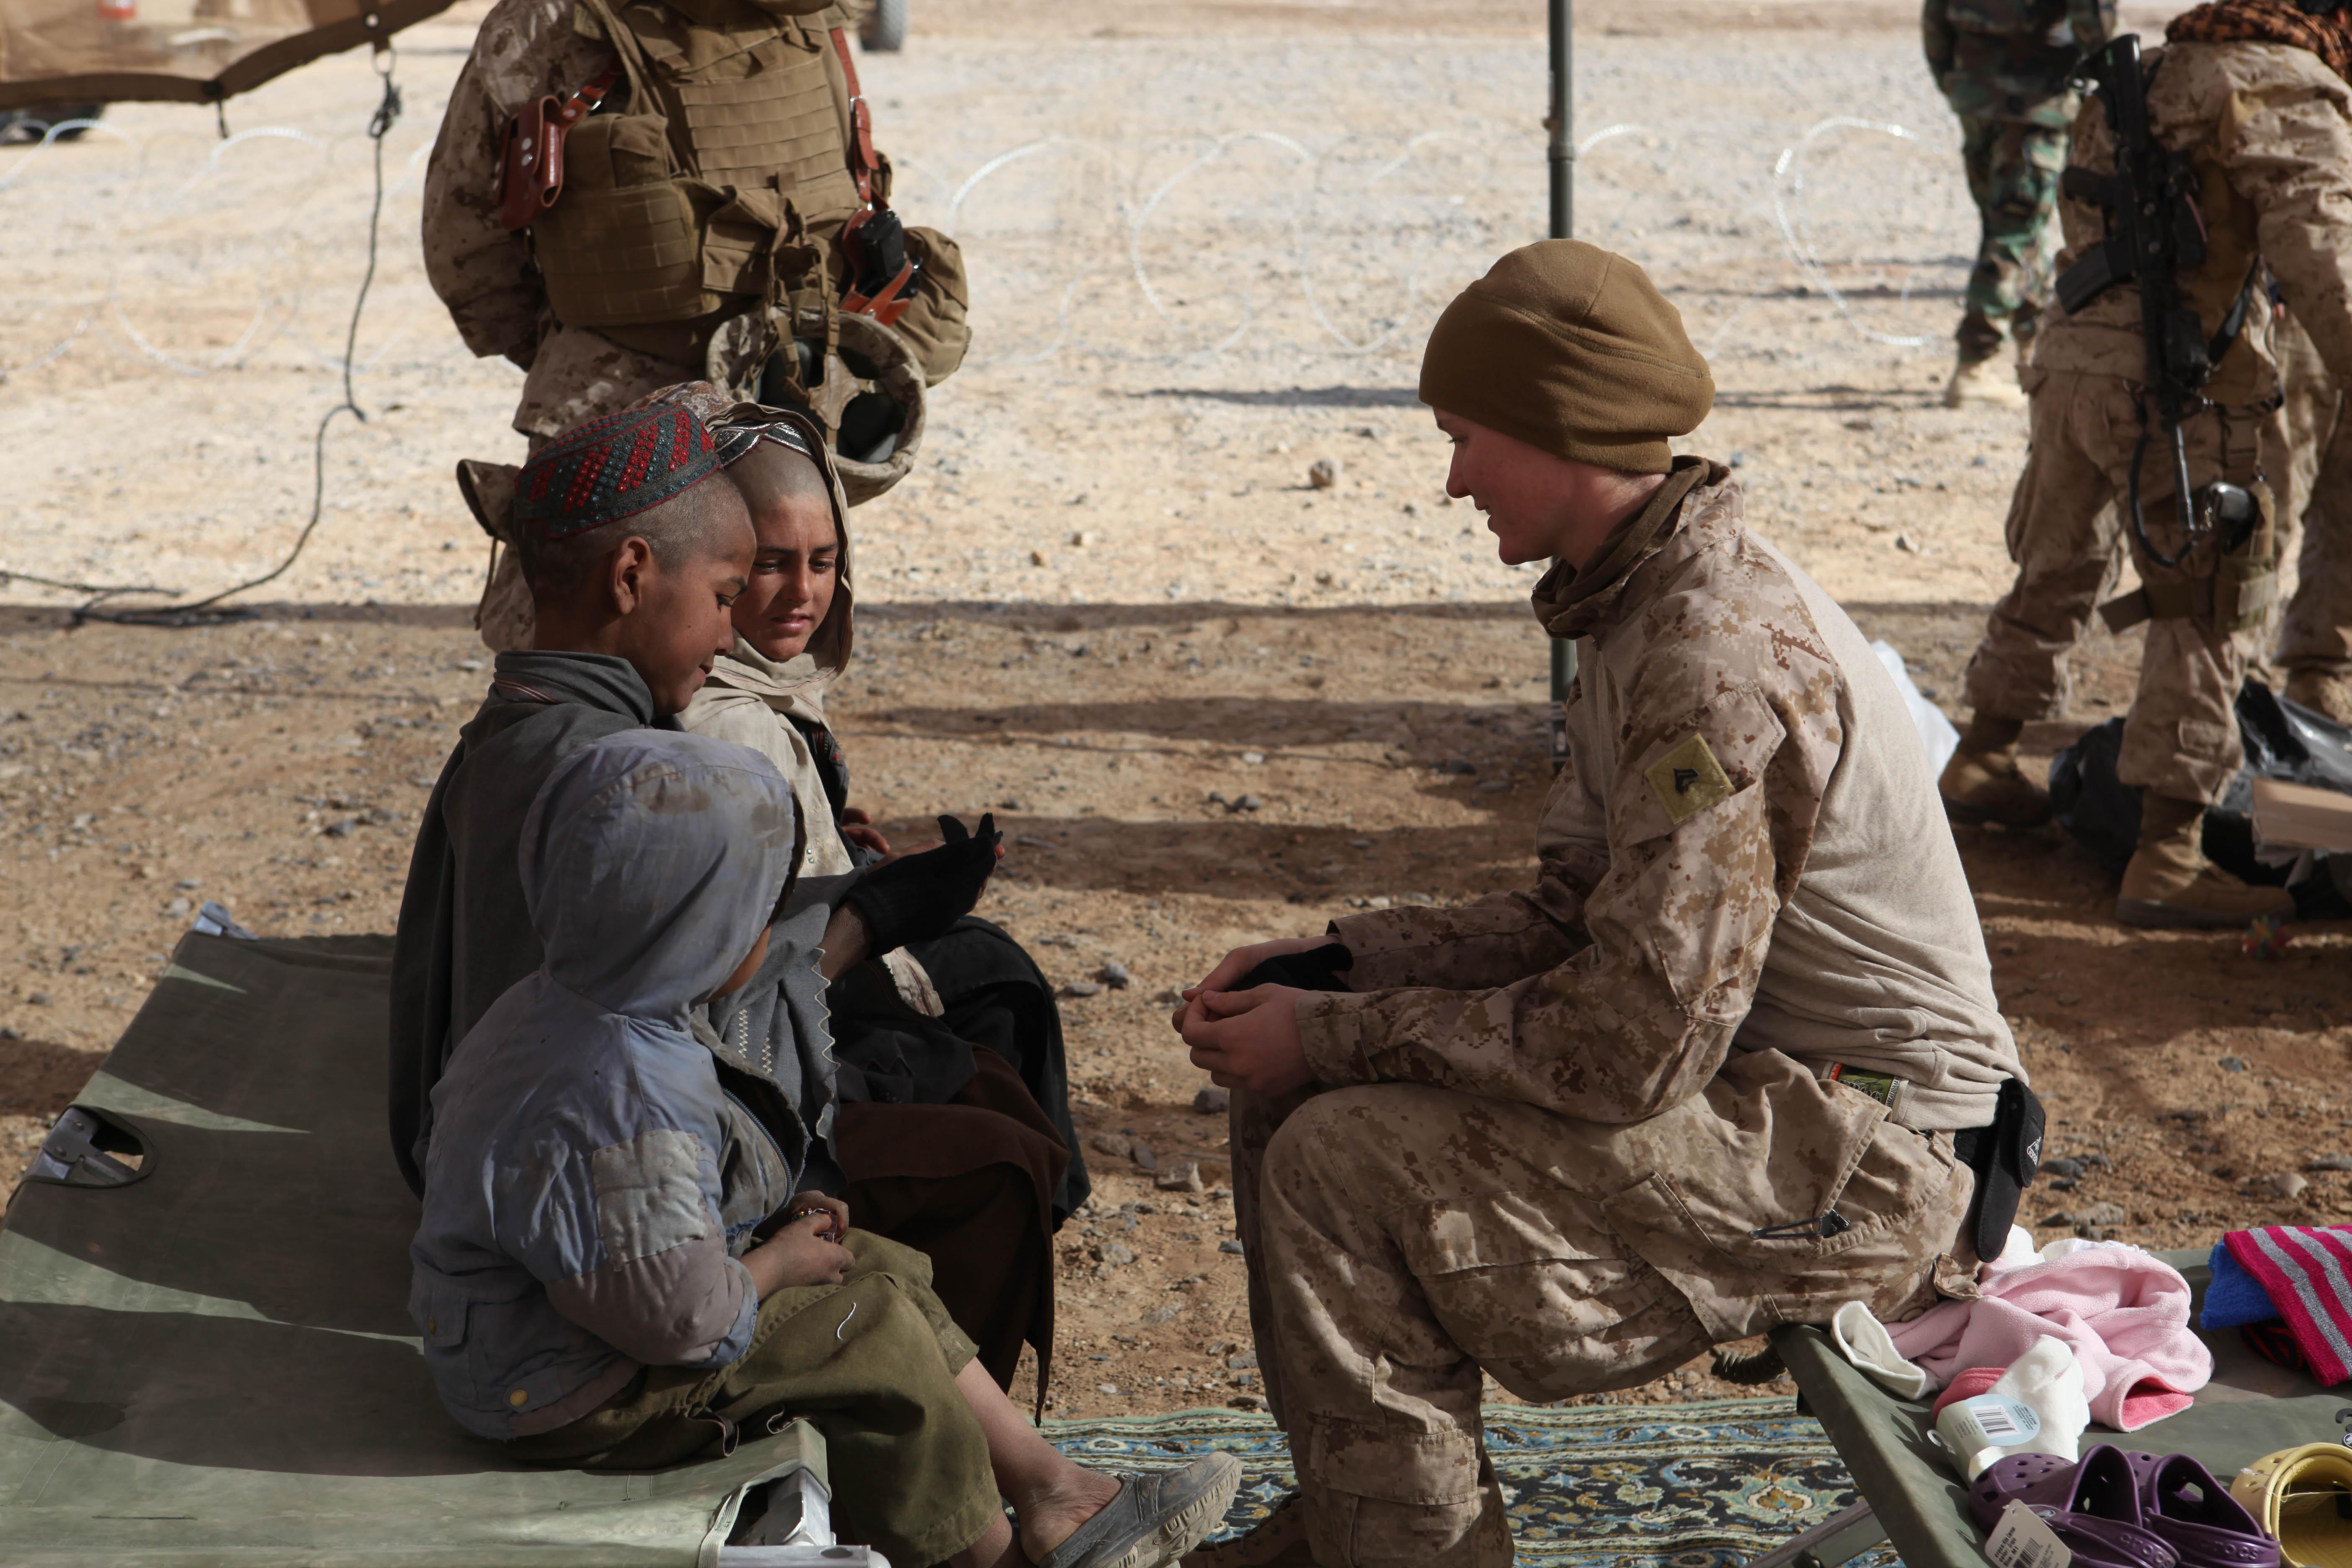 File:Defense.gov News Photo 101228-M-1392C-085 - U.S. Marine Corps ...